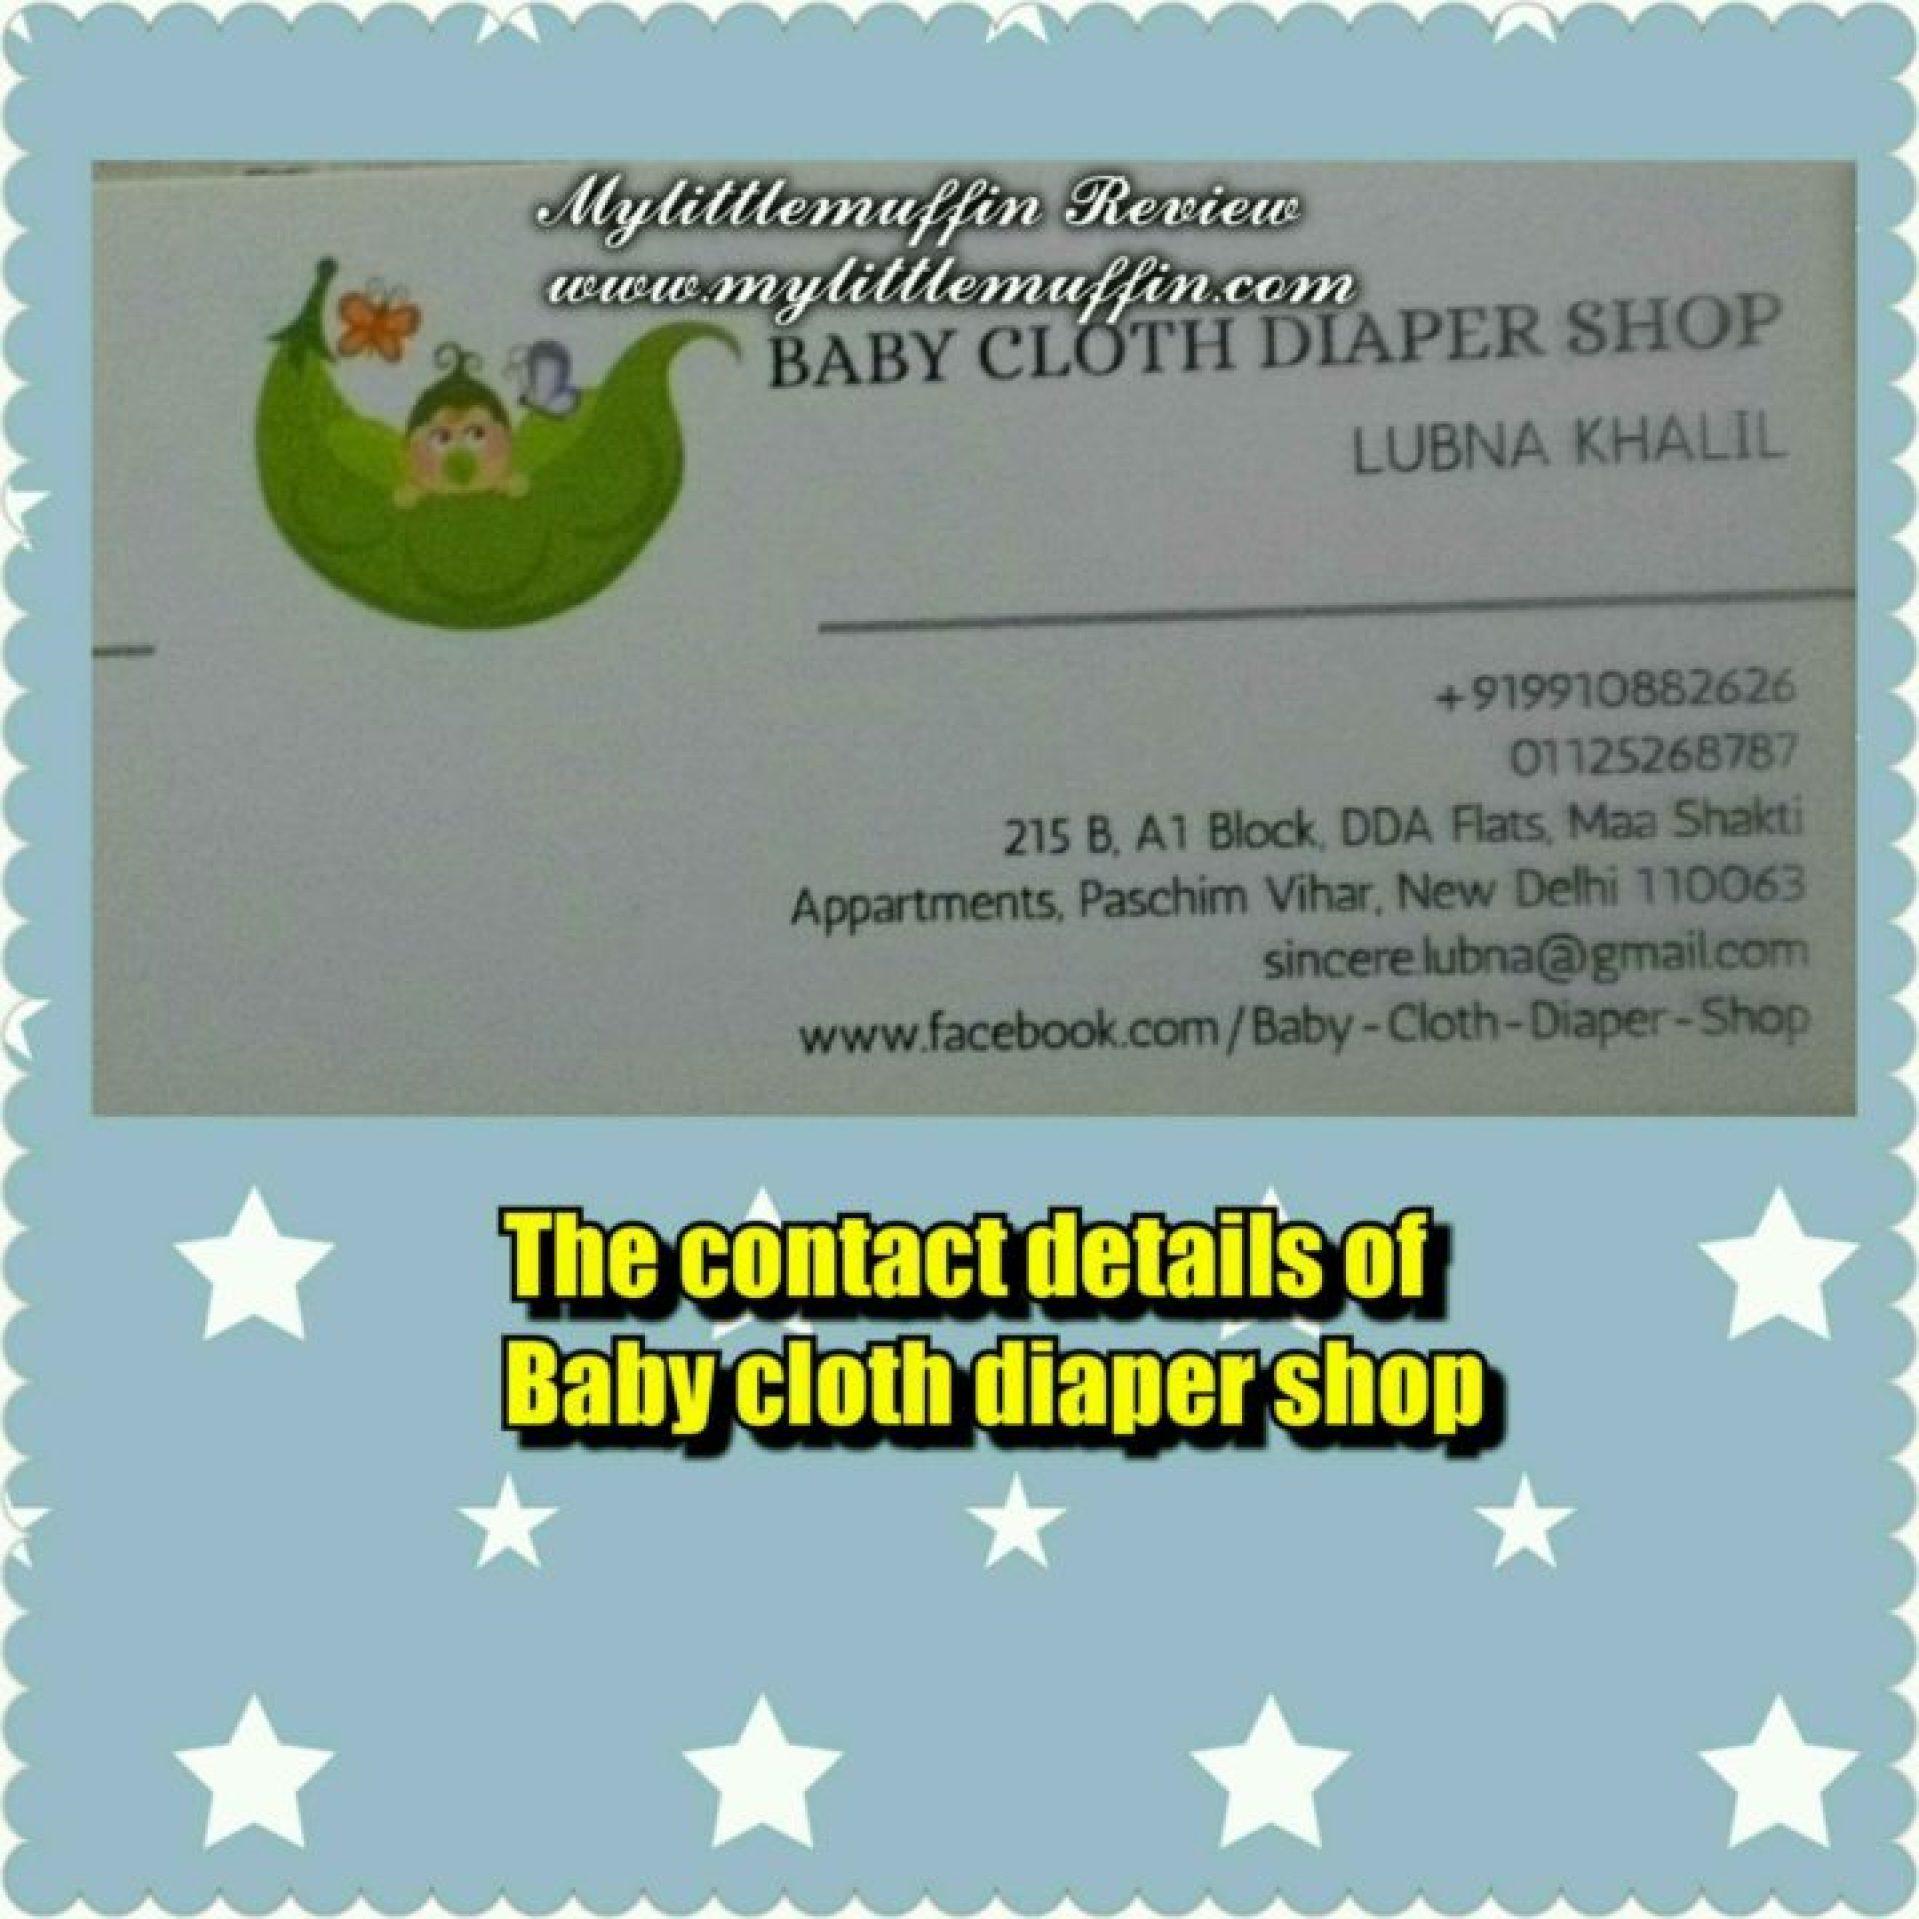 Baby cloth diaper shop